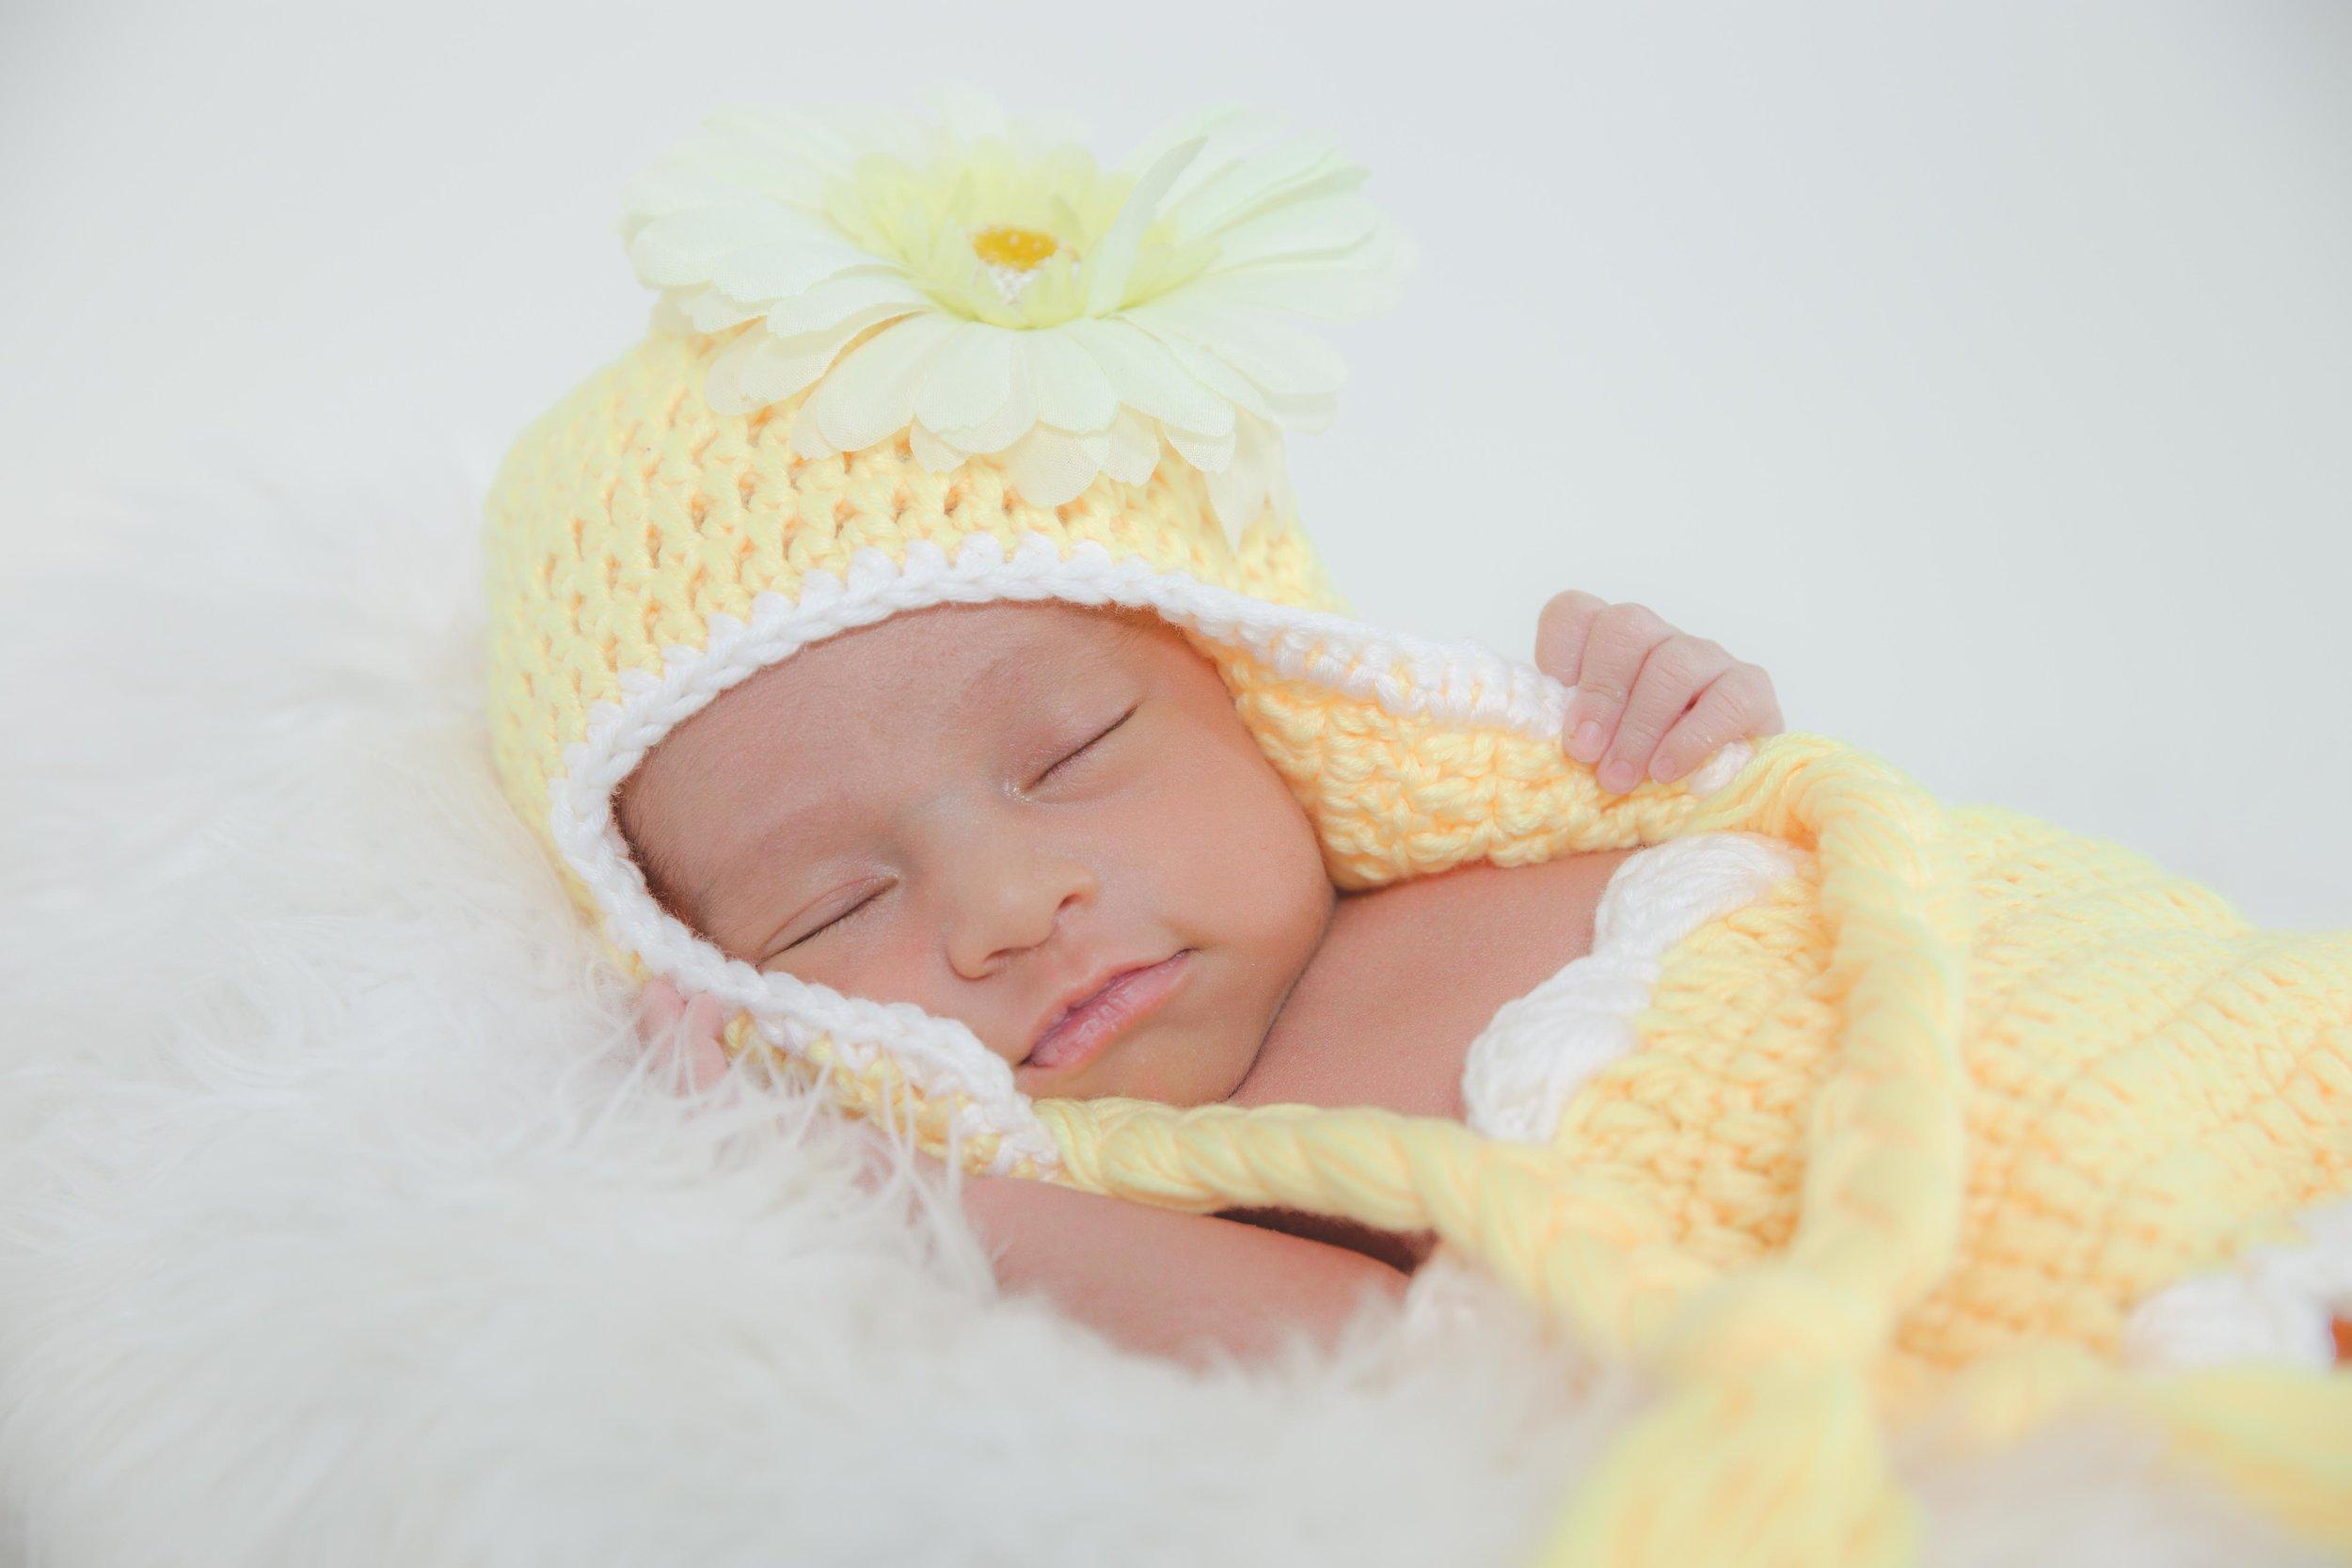 Newborn-photography-nyc-Brooklyn-best-4.jpg